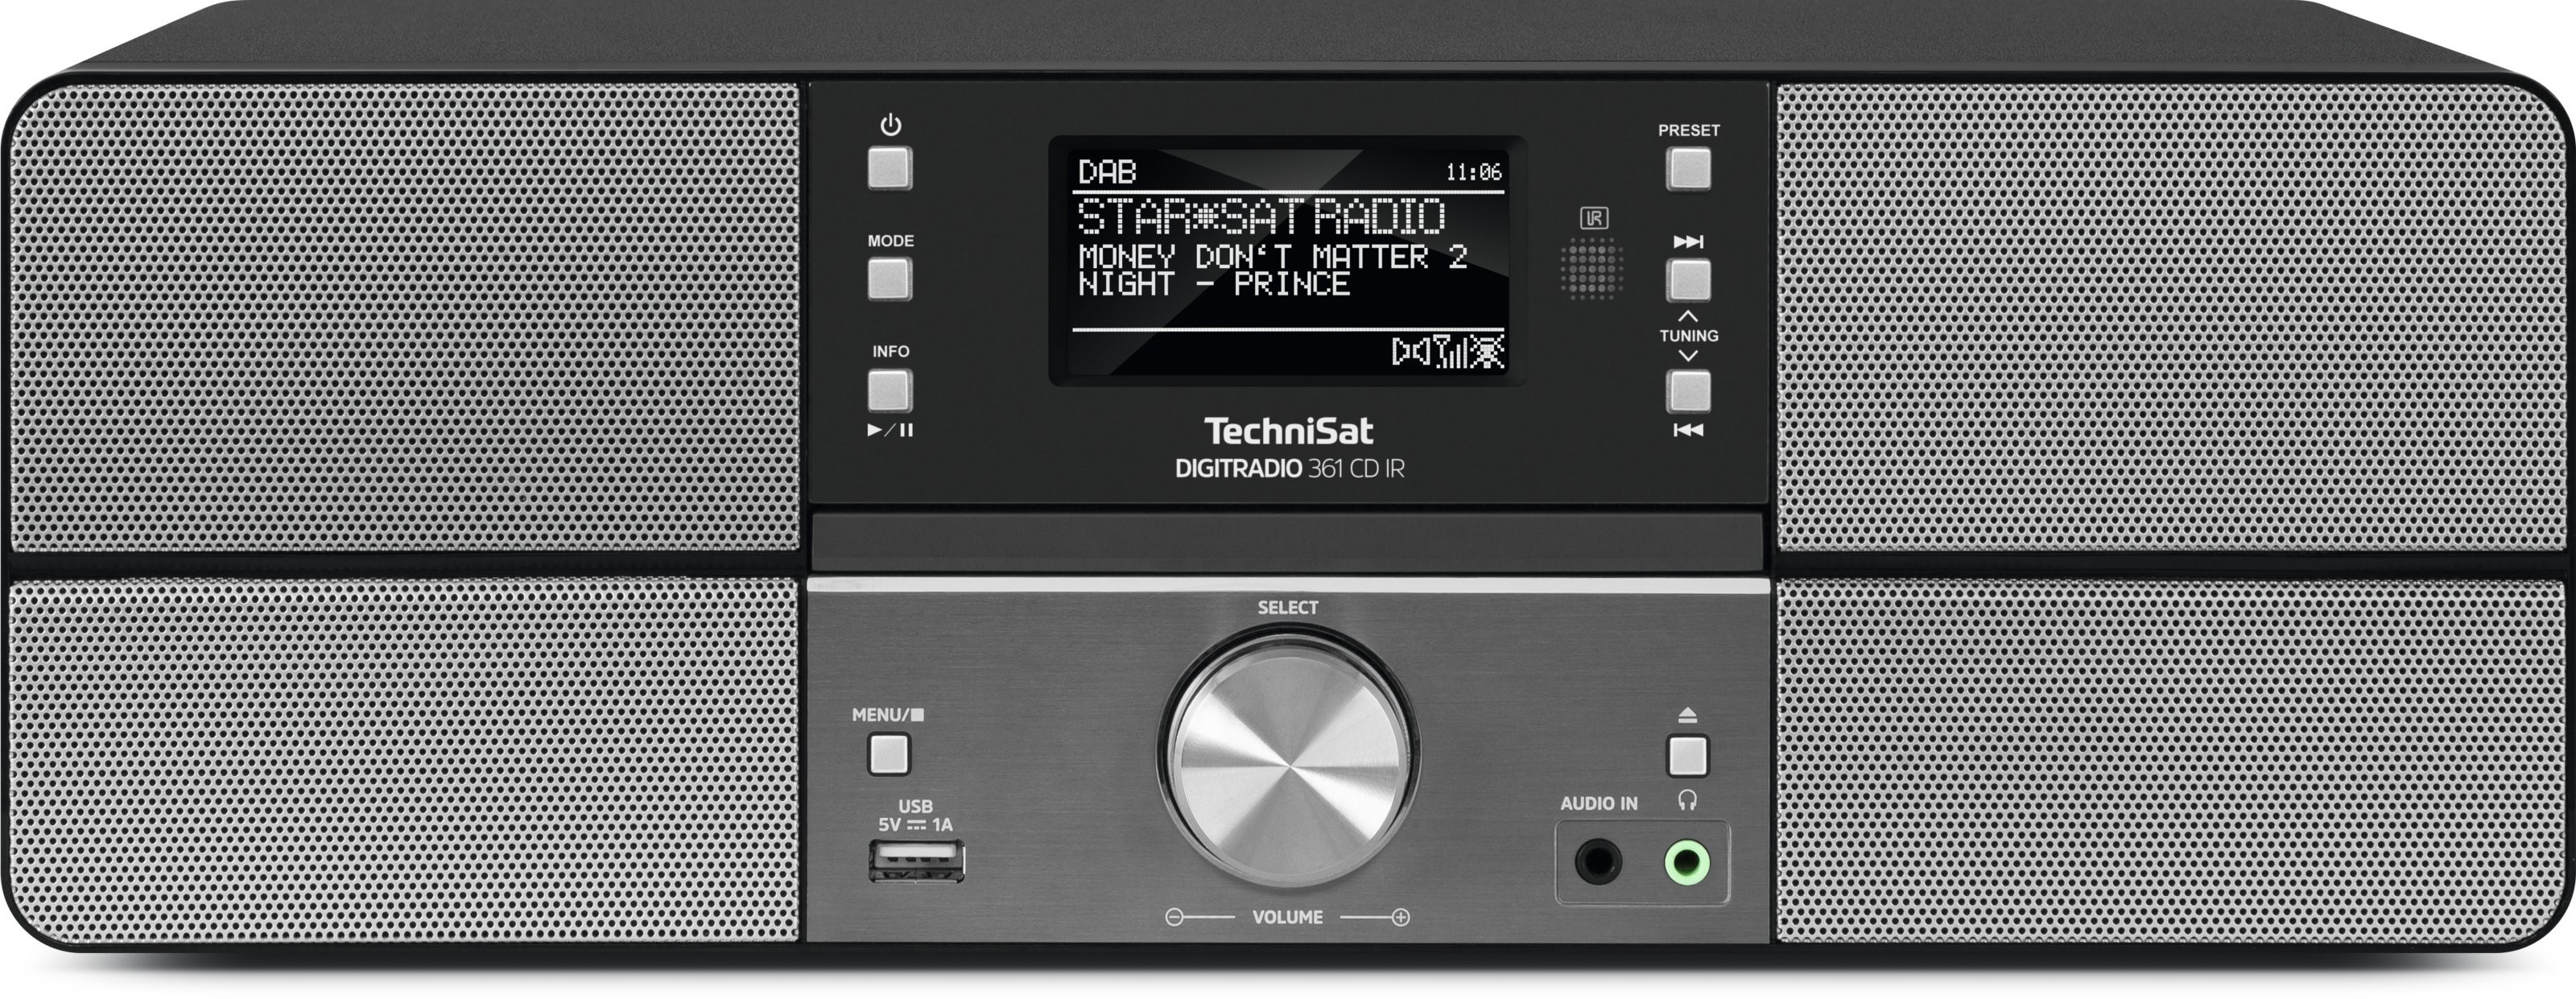 TechniSat DigitRadio 361 CD IR Anthrazit